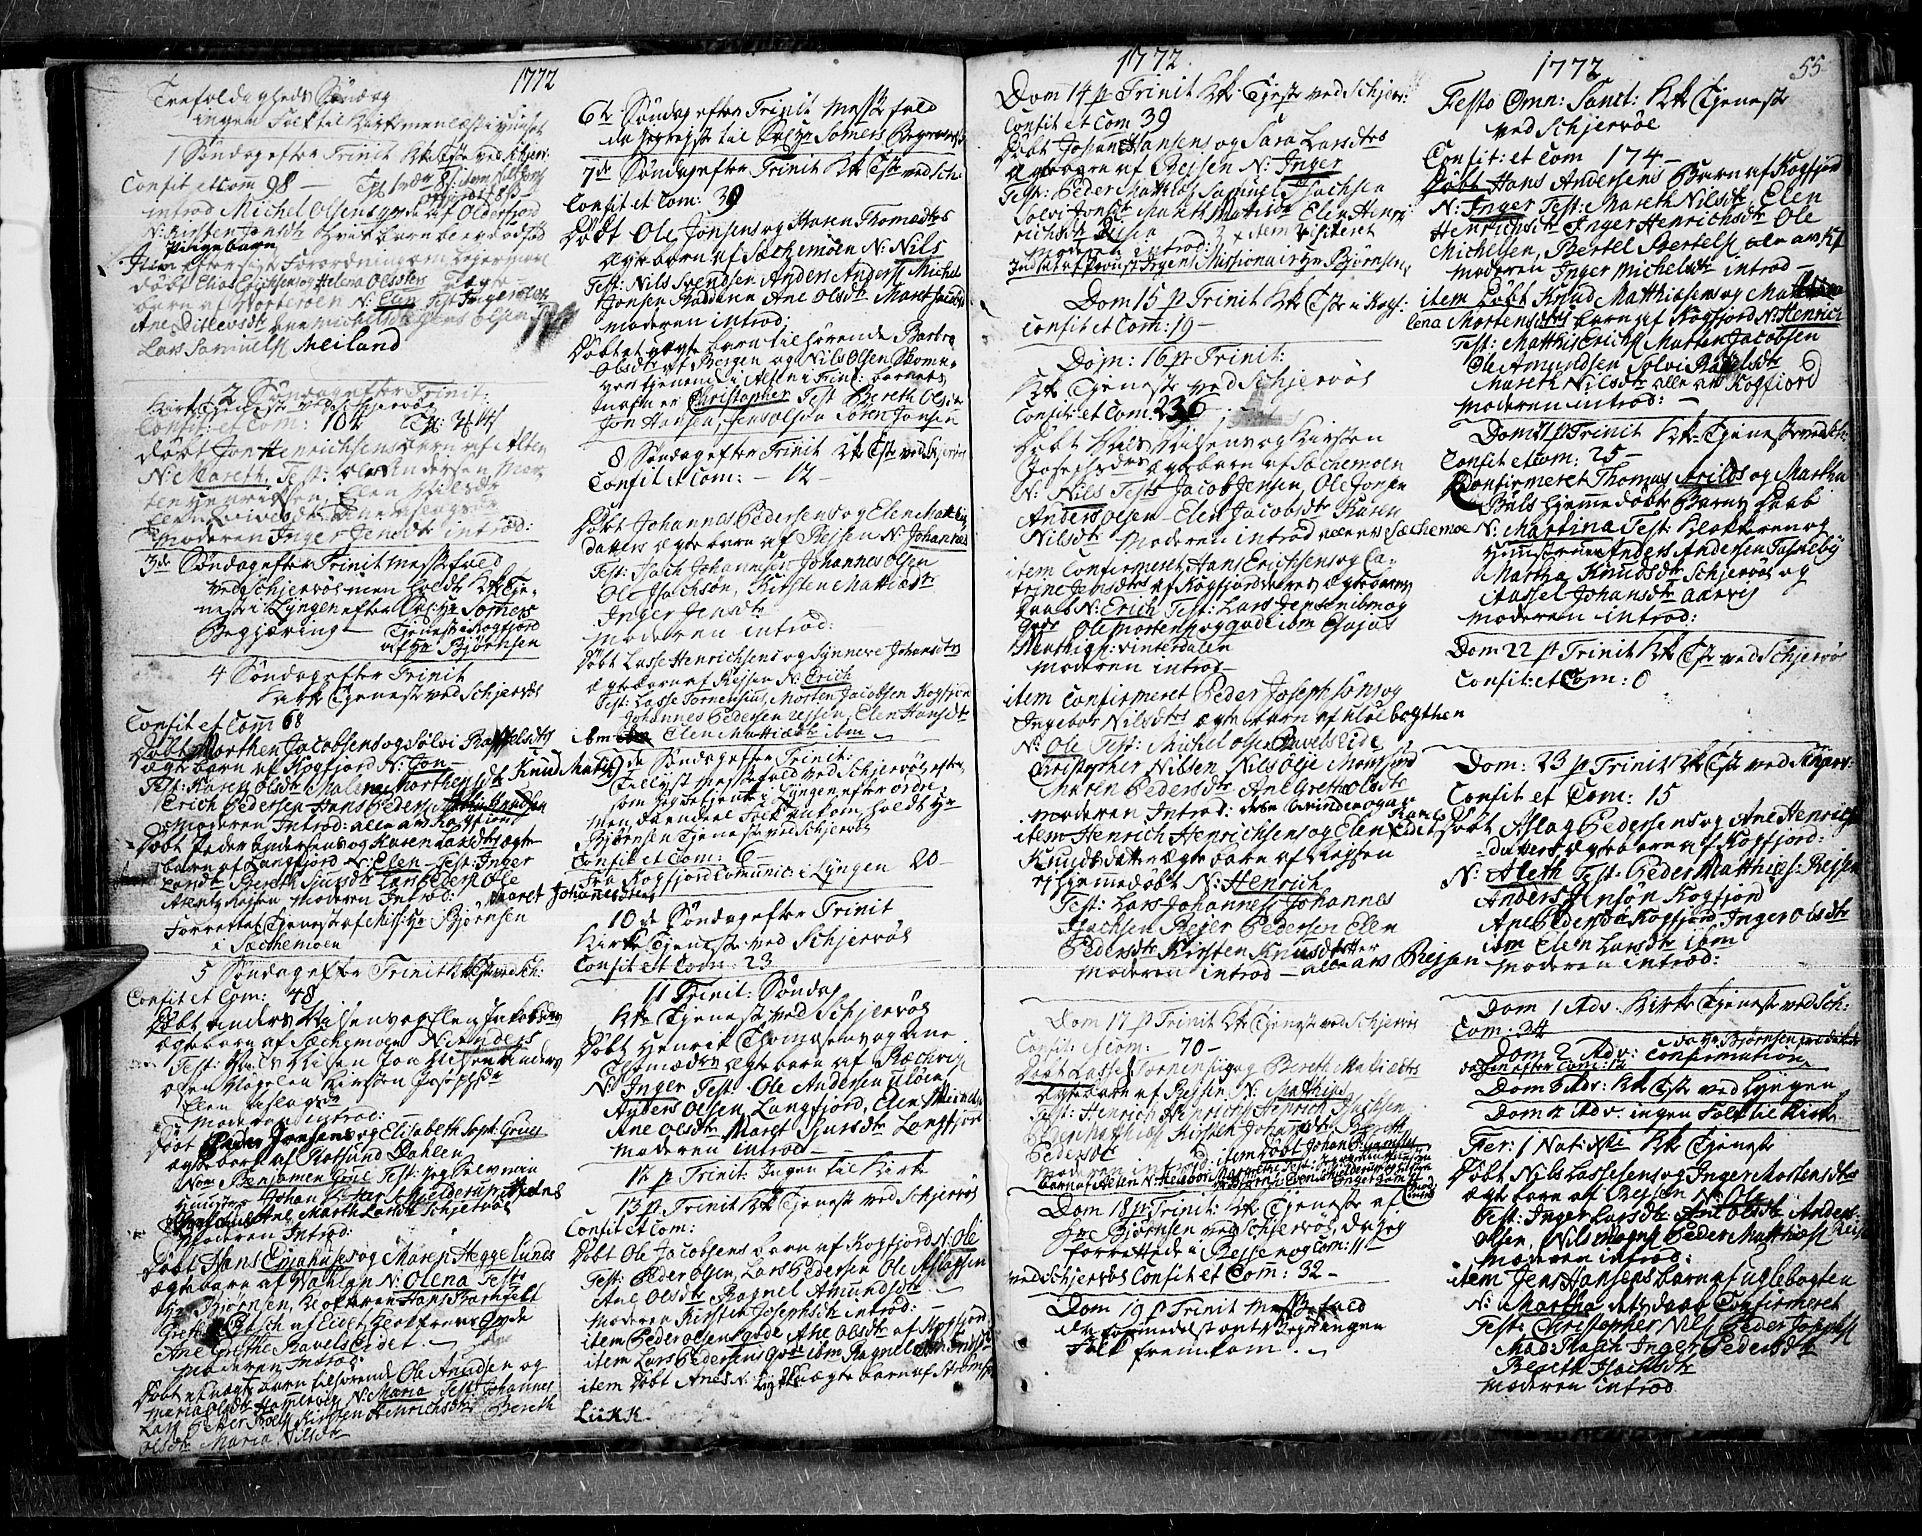 SATØ, Skjervøy sokneprestkontor, H/Ha/Haa/L0001kirke: Ministerialbok nr. 1, 1748-1780, s. 55